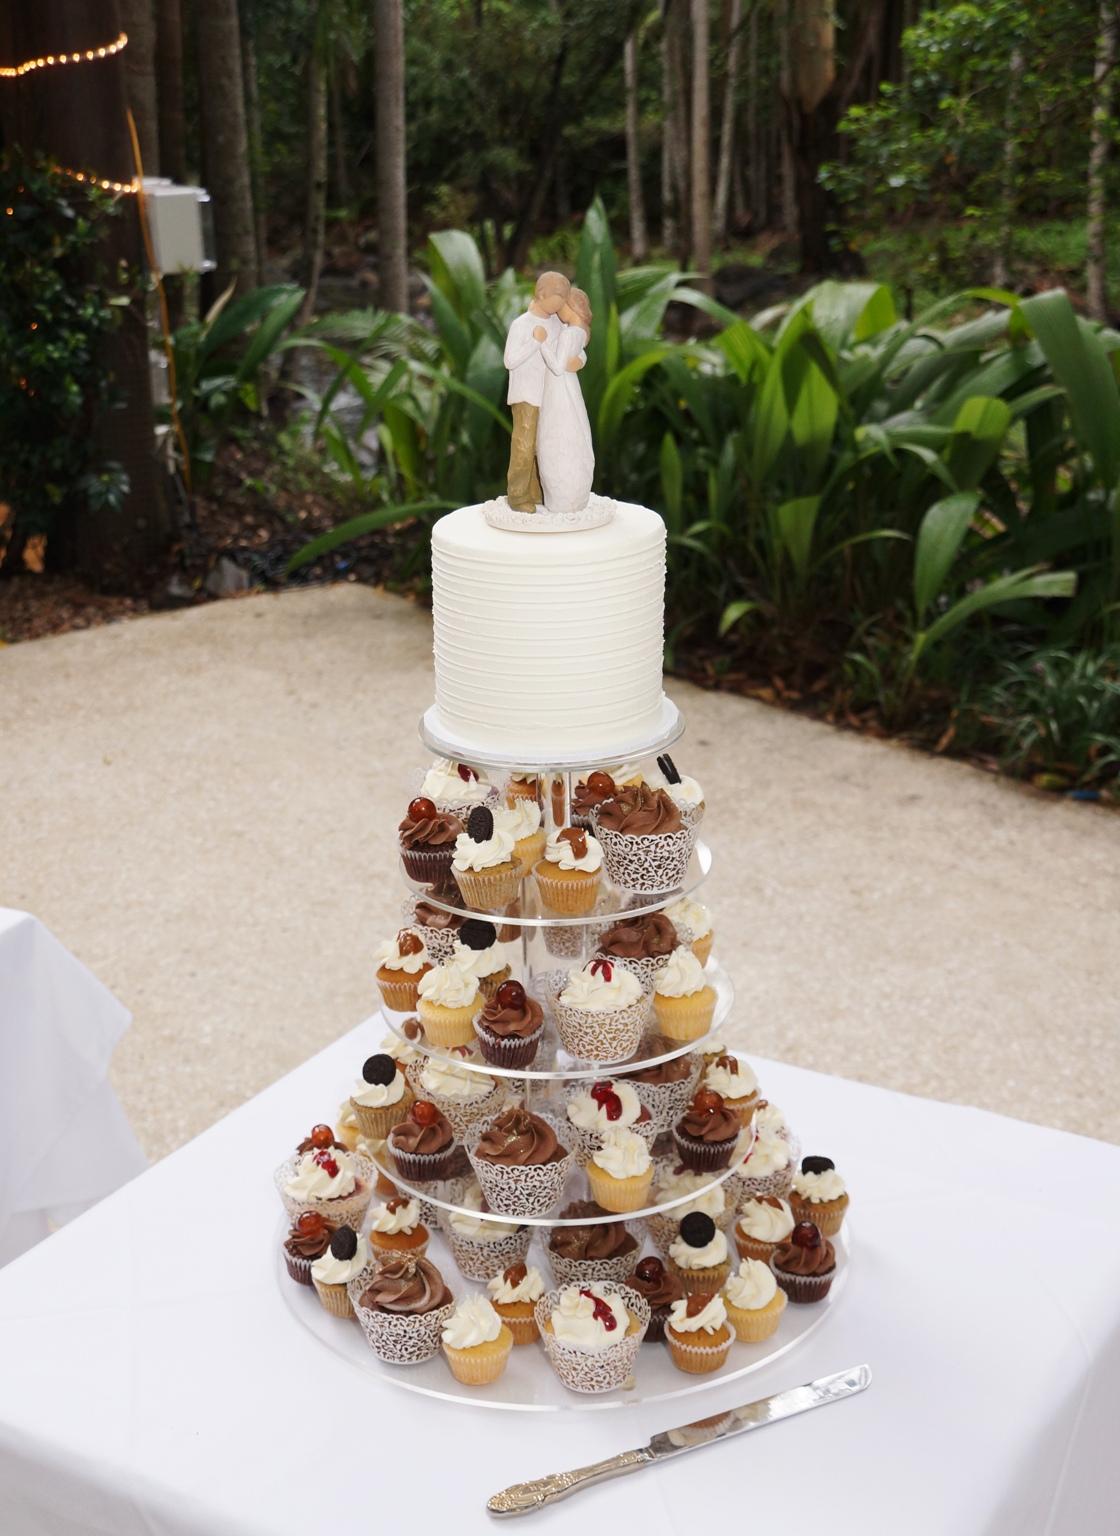 Cupcake Tower 23.02.20